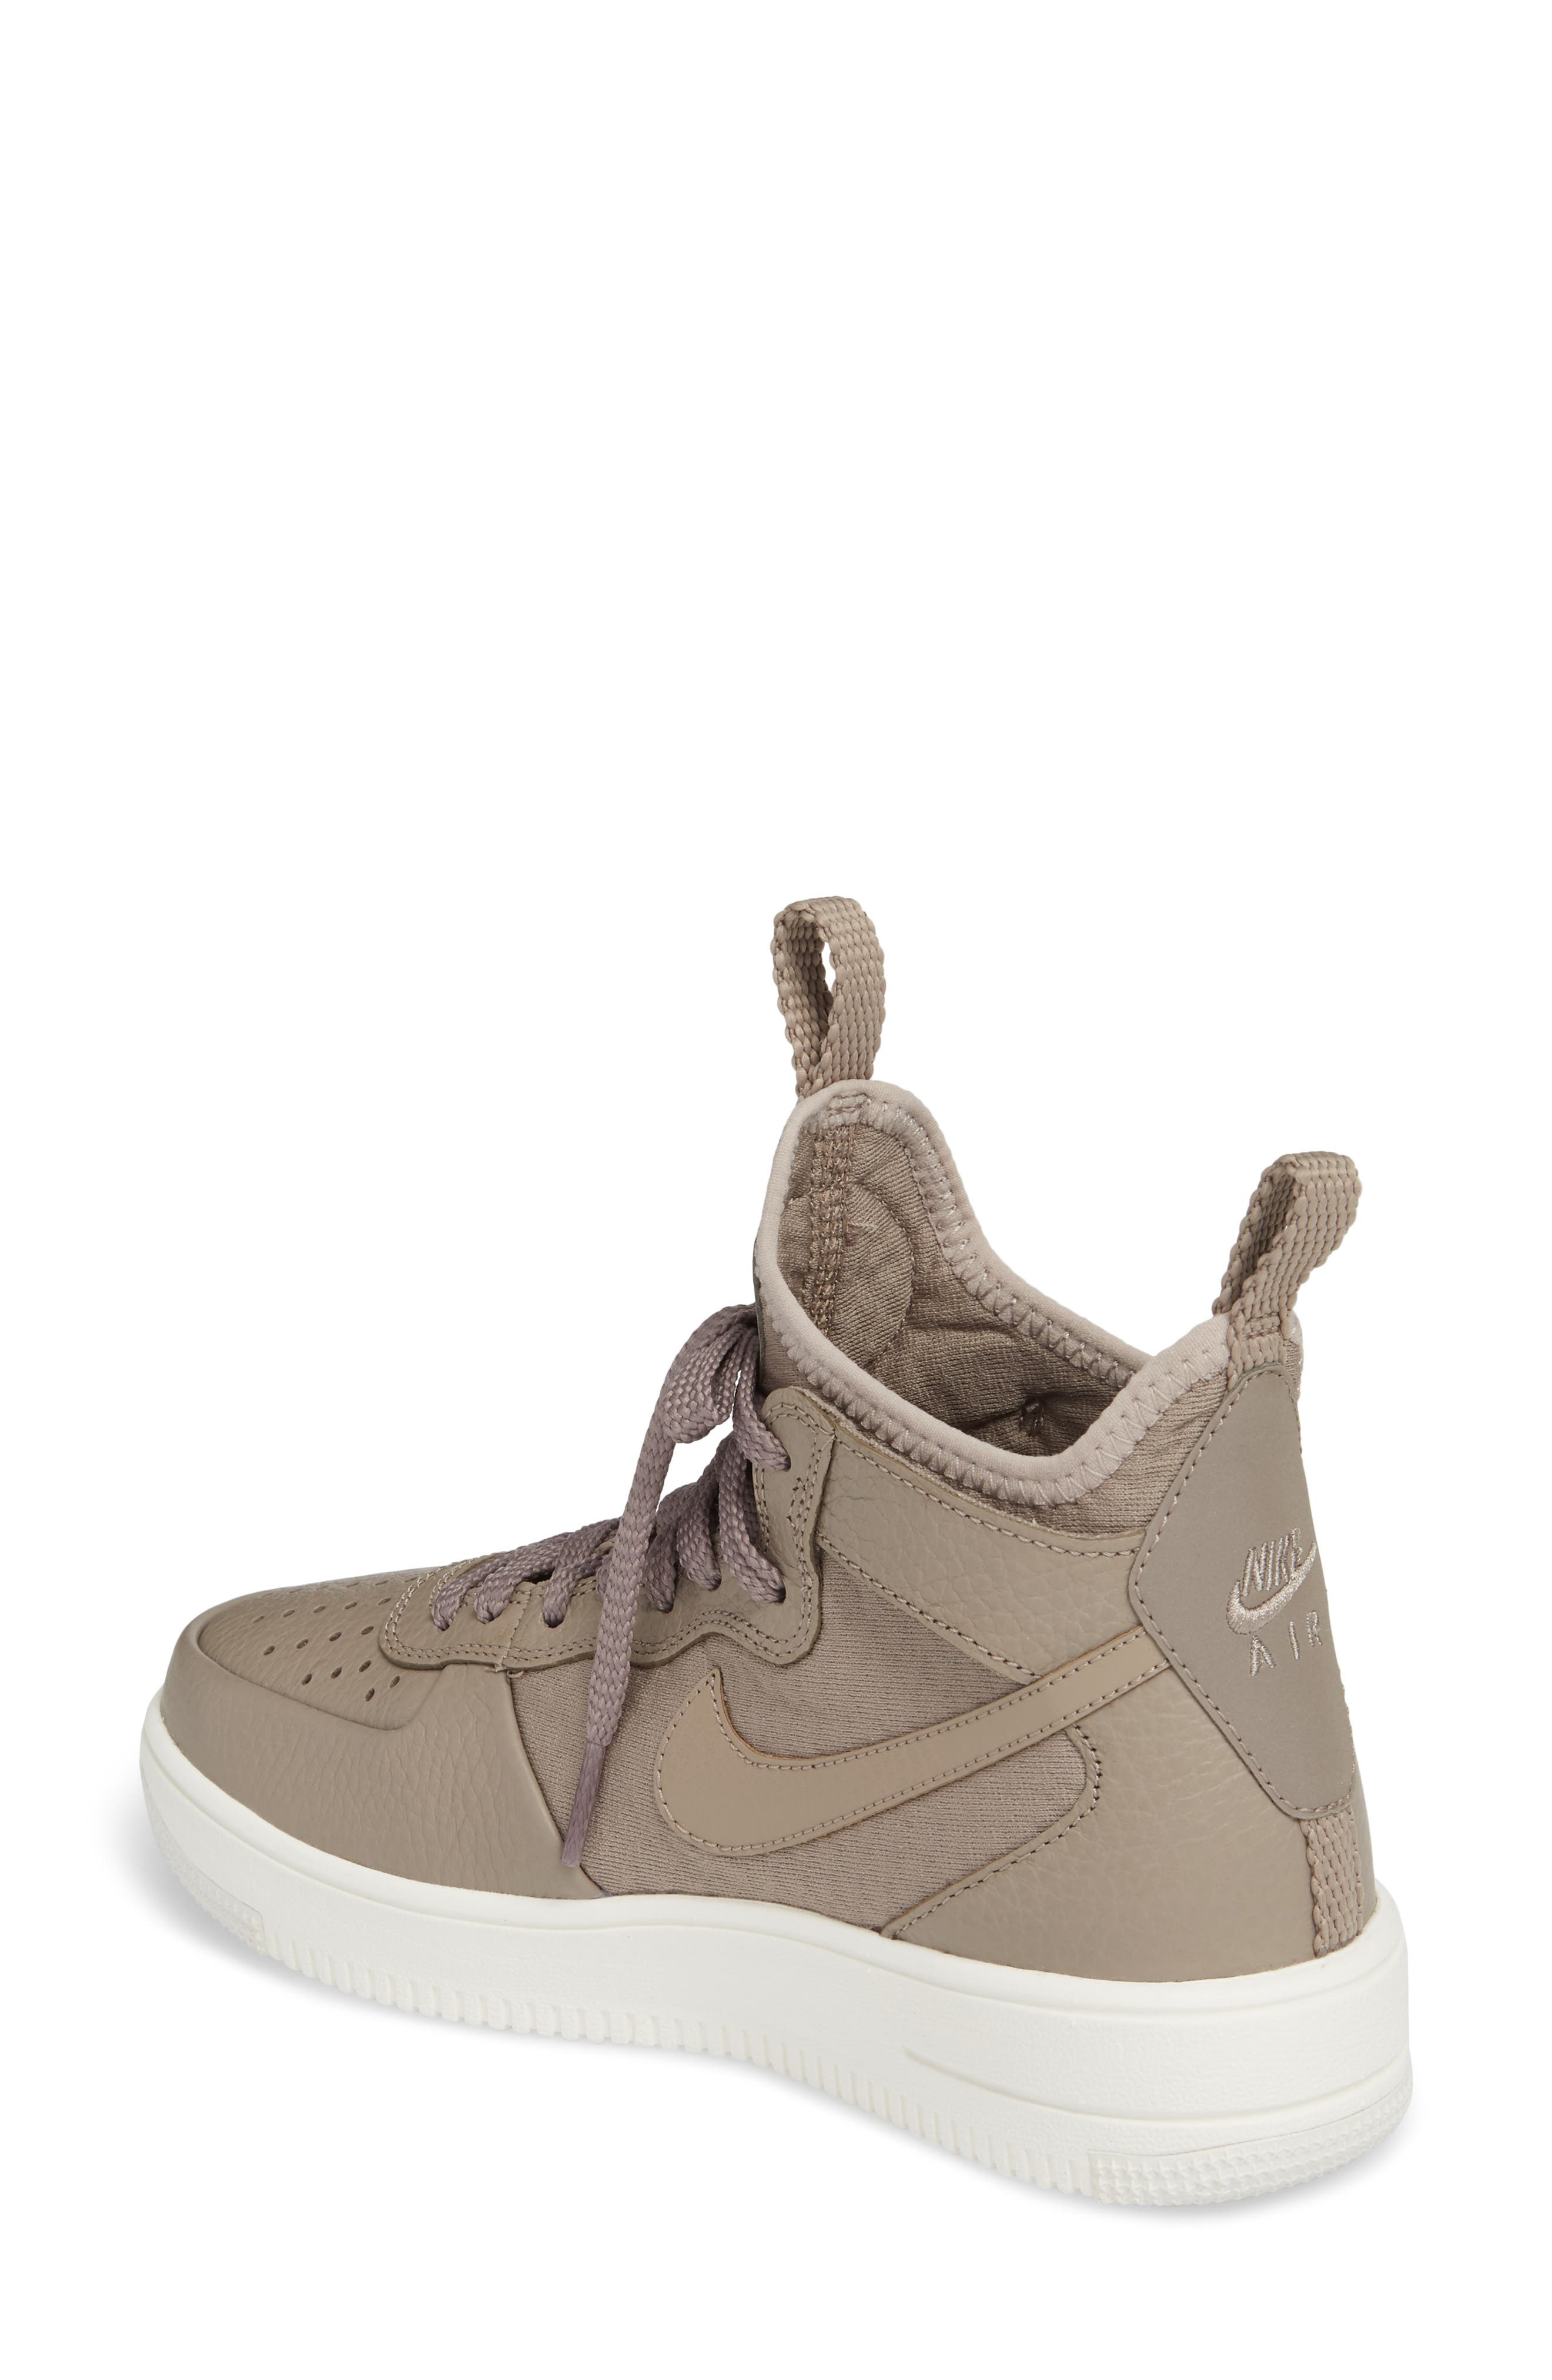 Air Force 1 Ultraforce Mid Sneaker,                             Alternate thumbnail 2, color,                             022